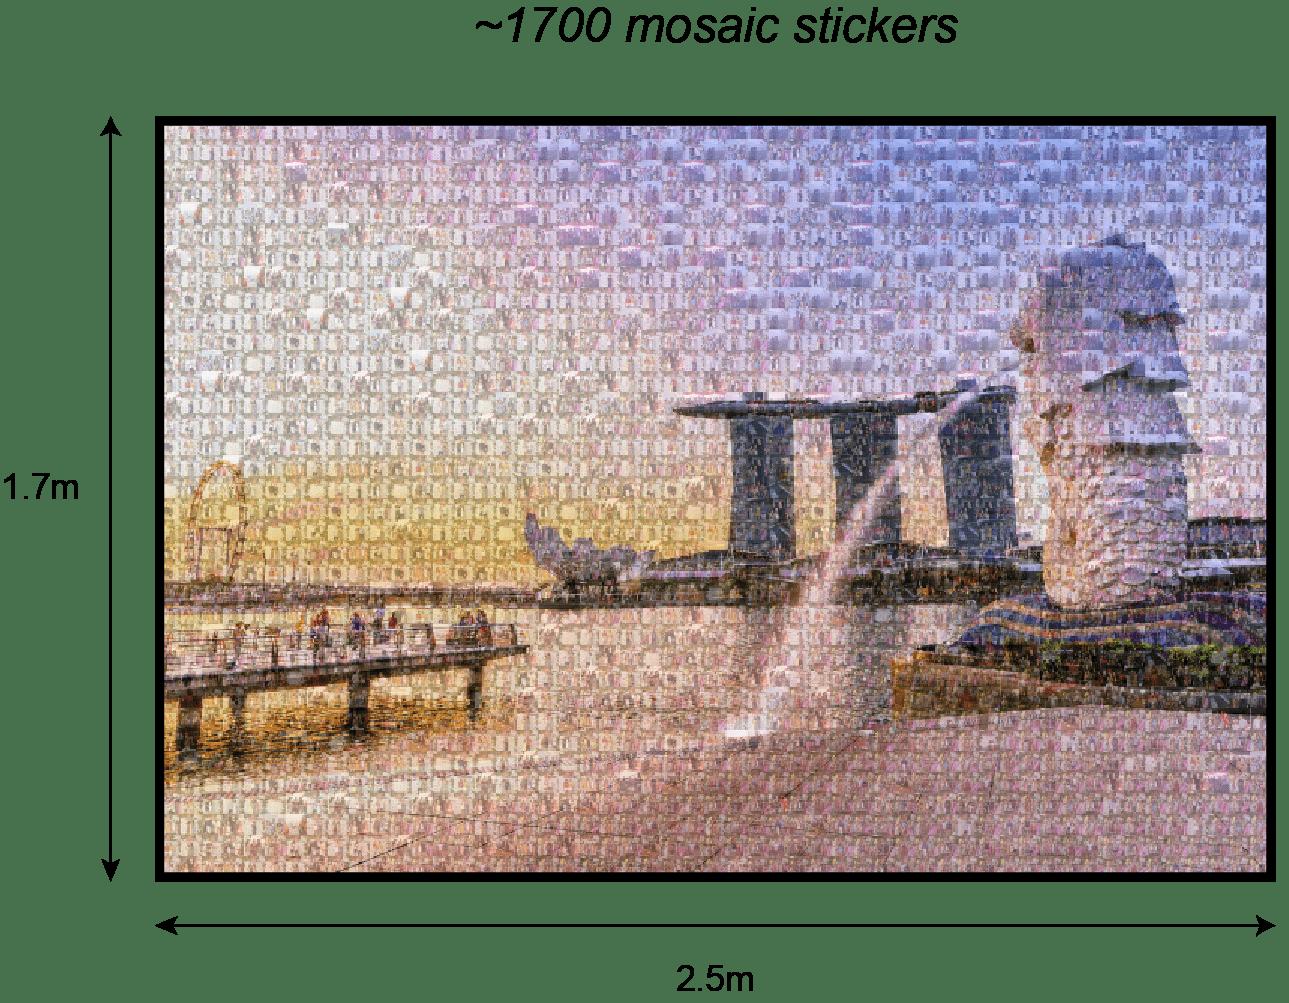 Mosaic Wall Photo Booth Singapore